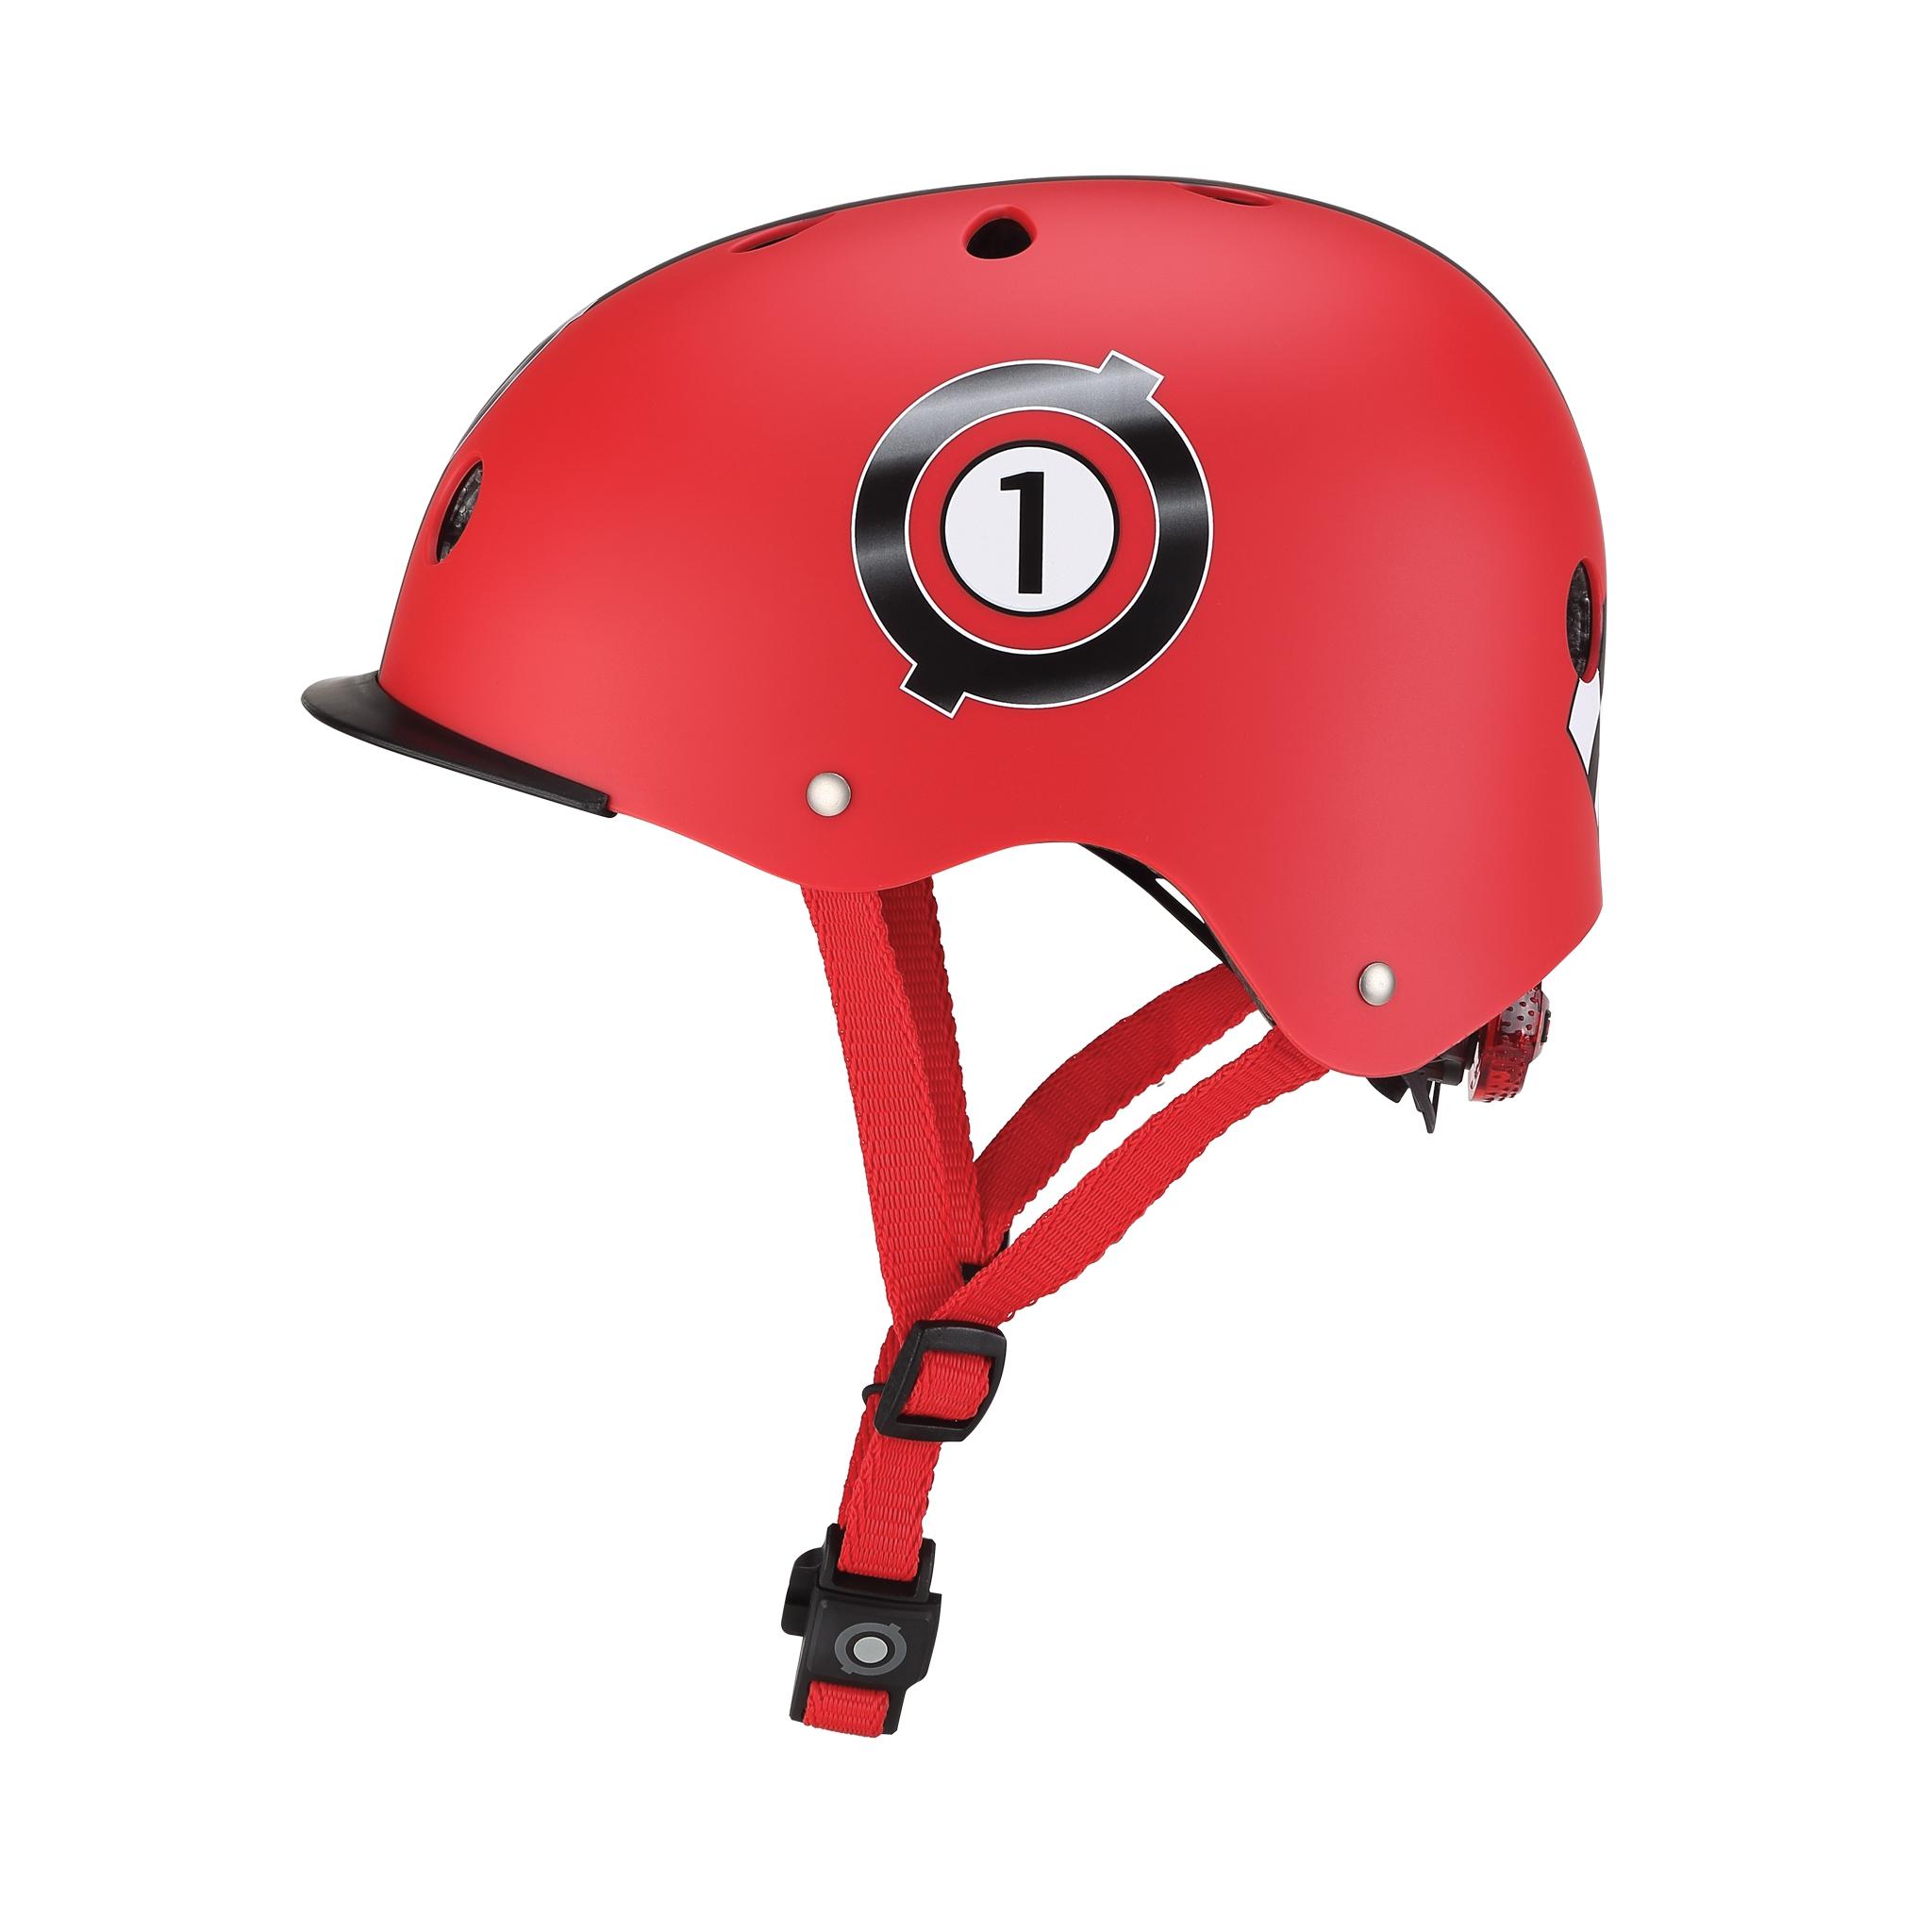 ELITE-helmets-scooter-helmets-for-kids-with-adjustable-helmet-knob-new-red 1